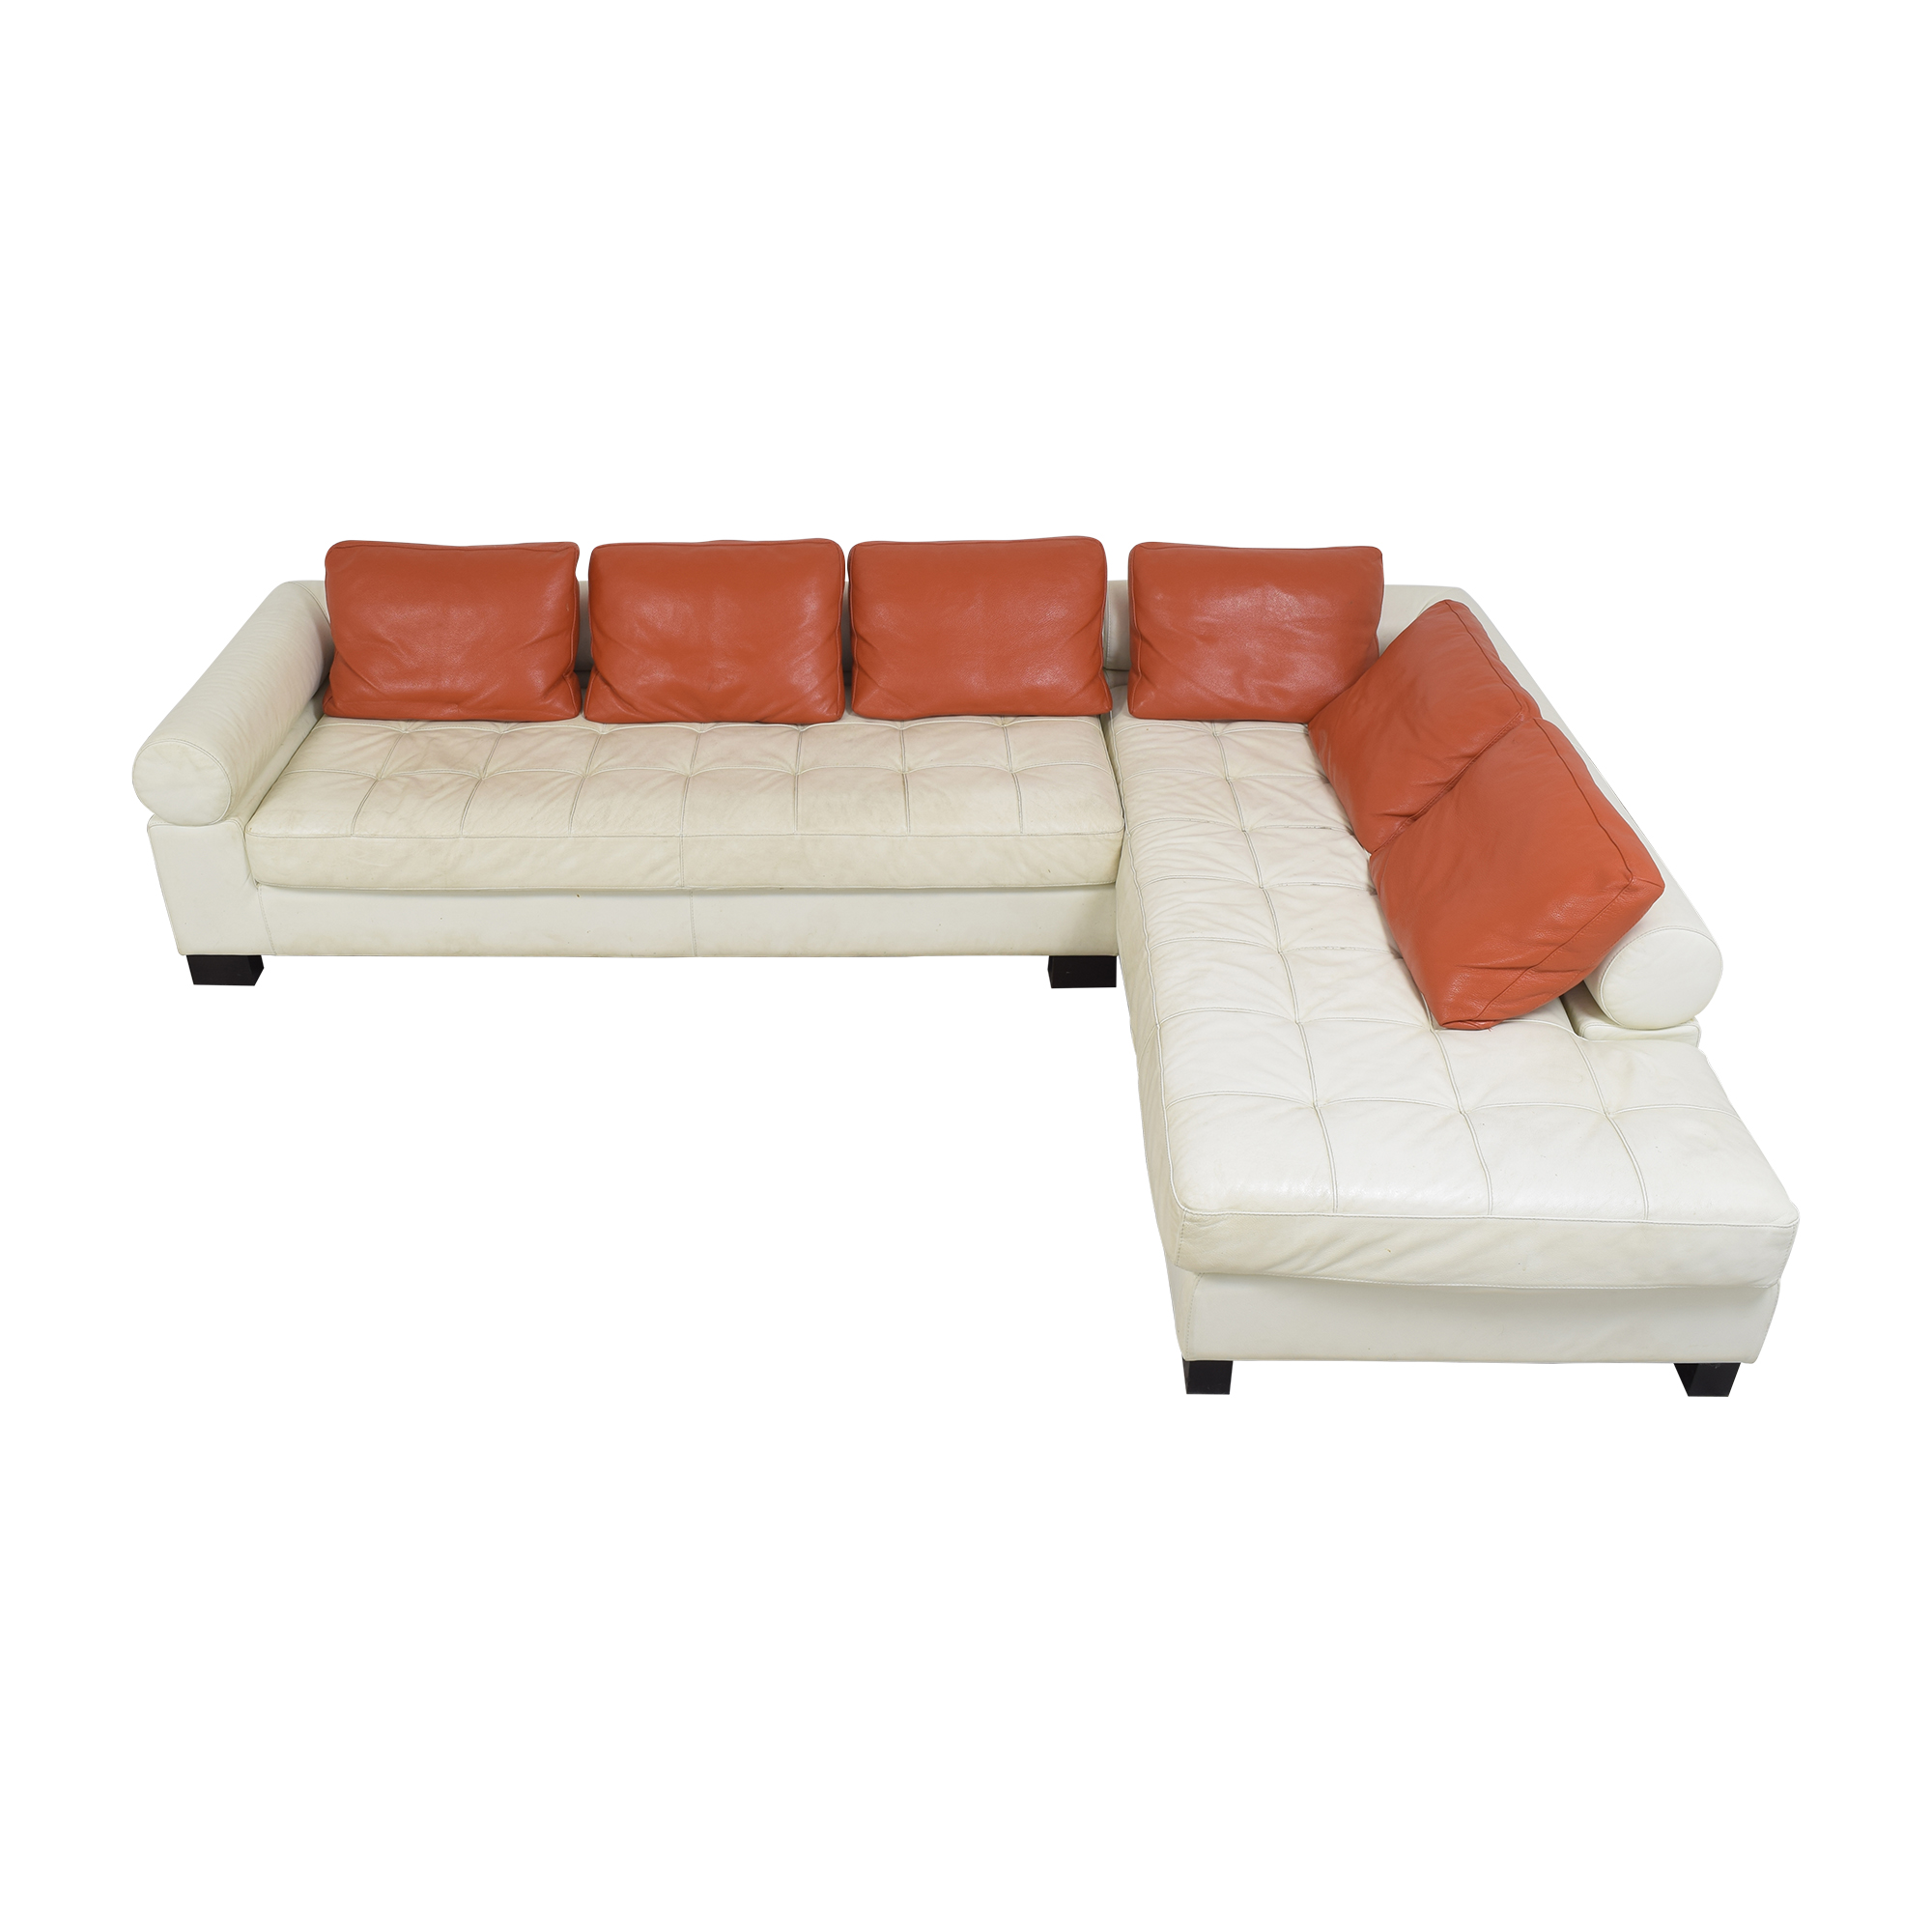 Casa Novalia Casa Novalia Modern Sectional Sofa price